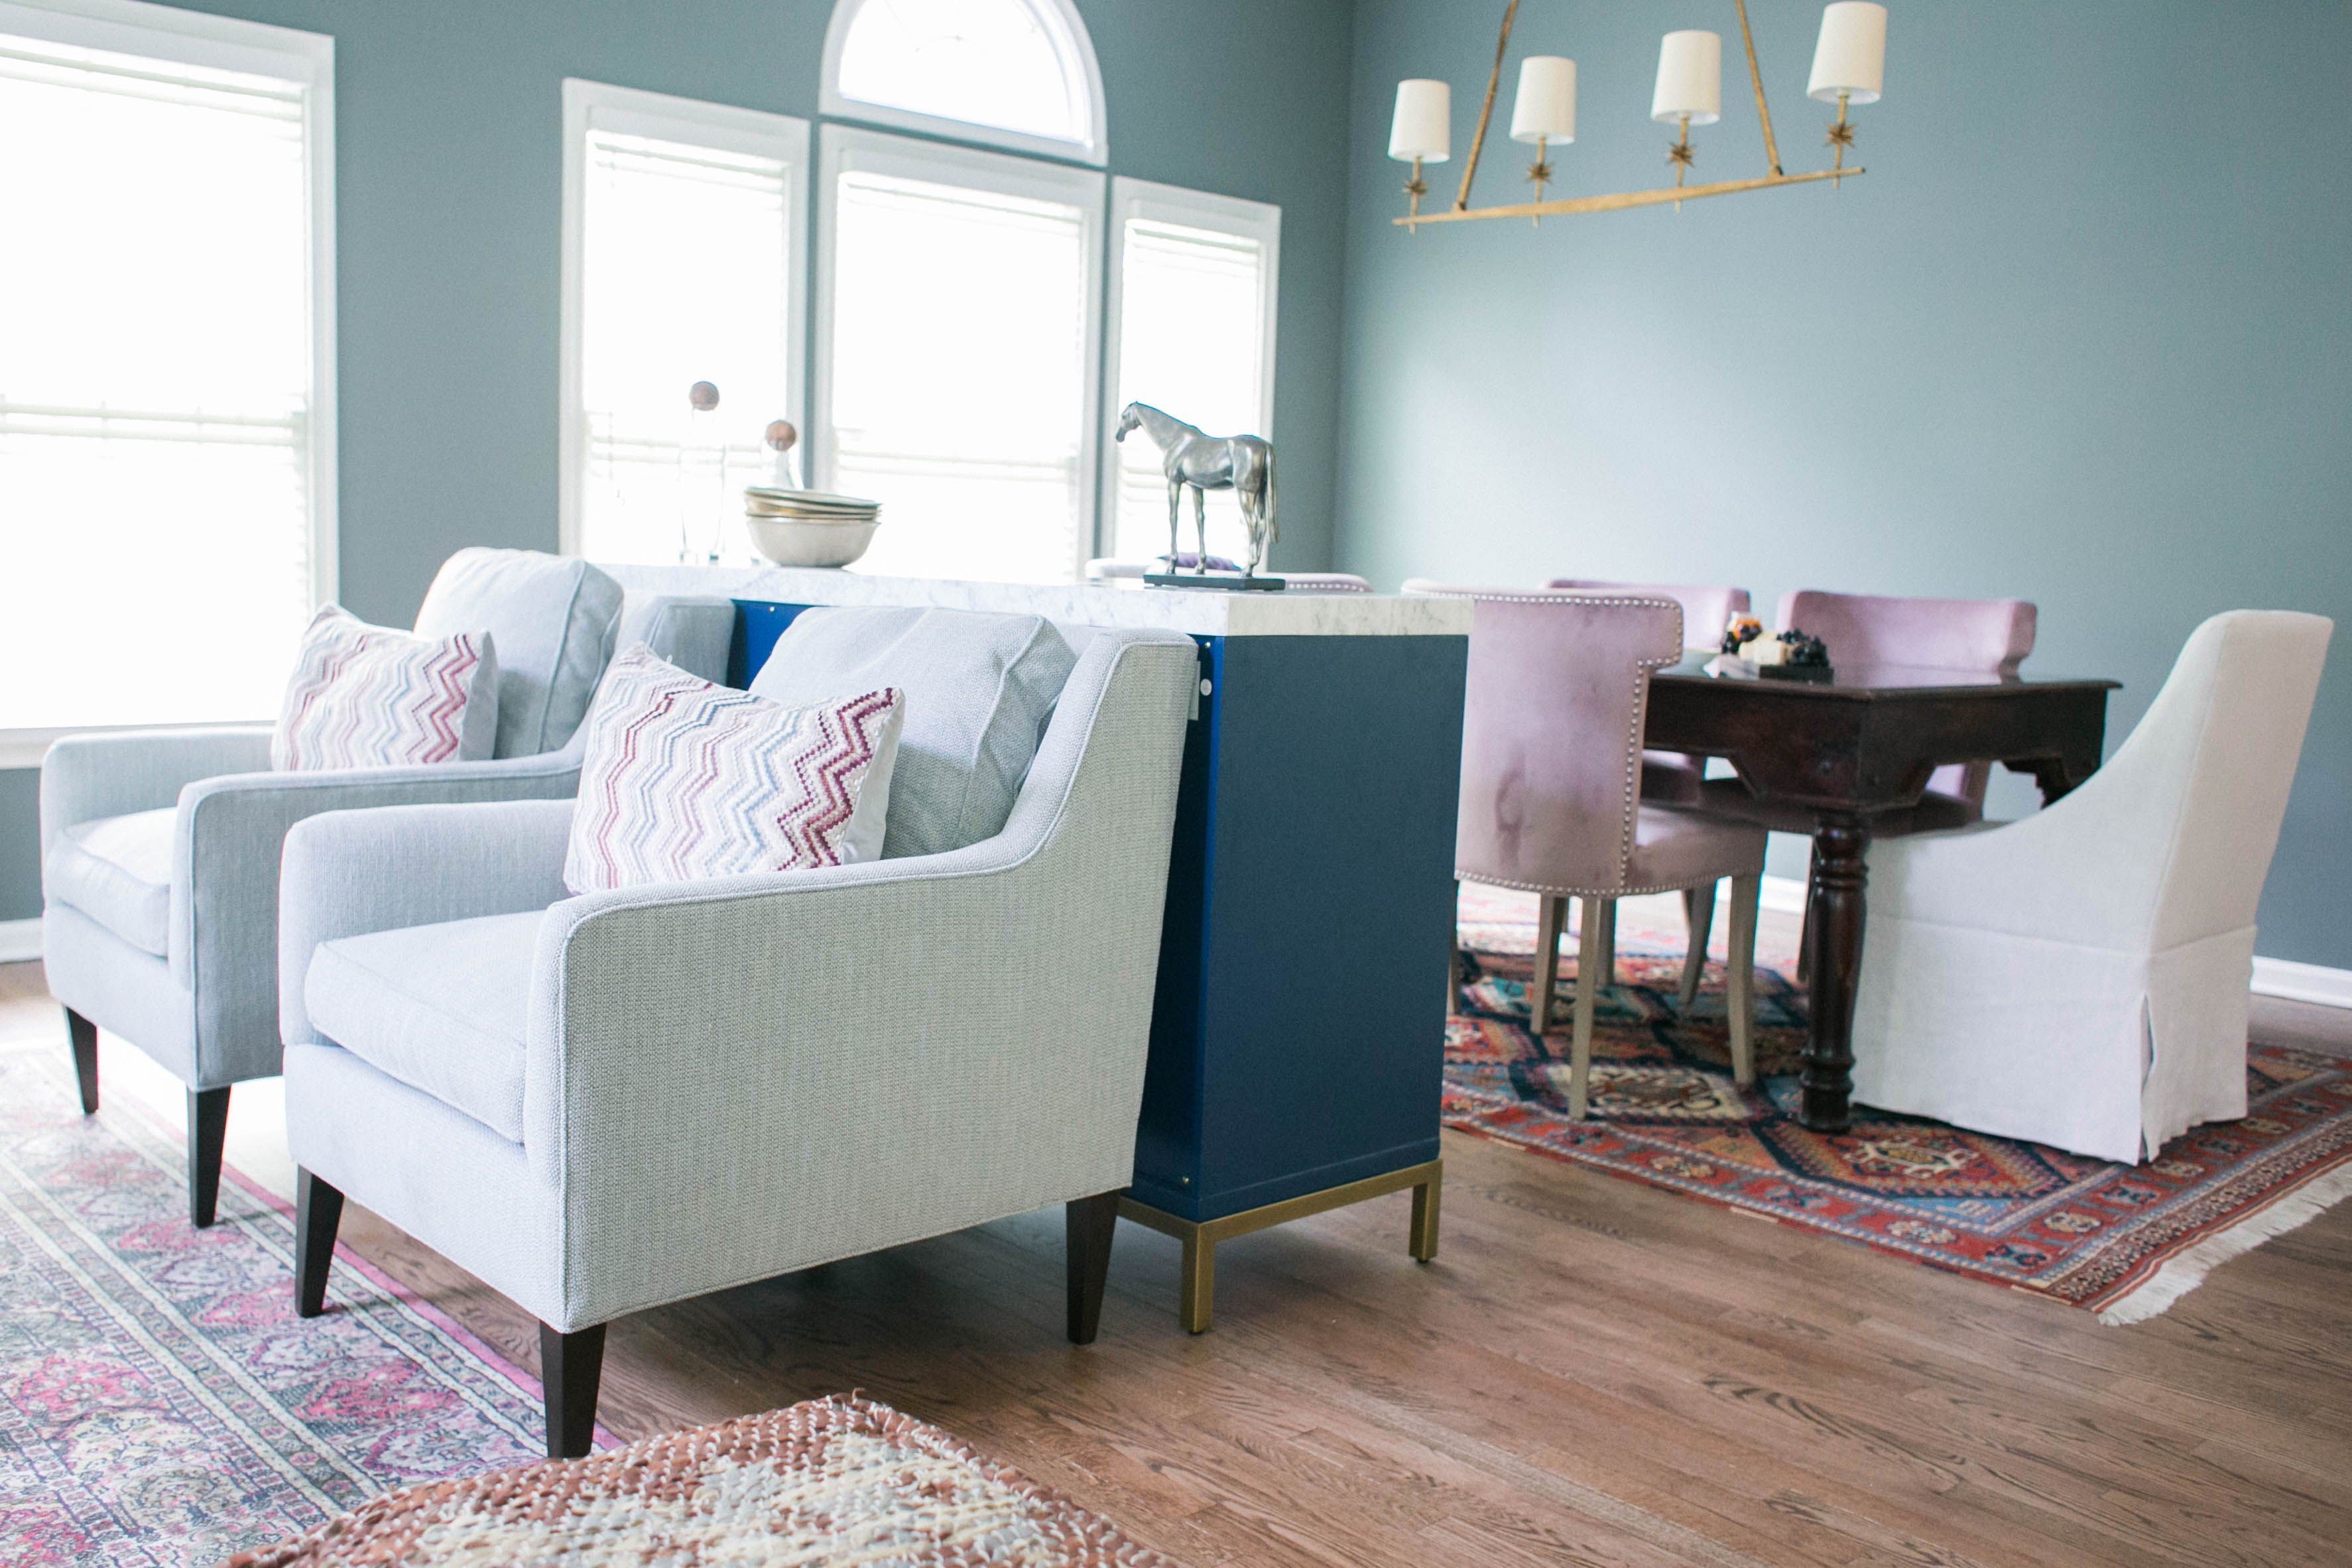 Living Room Decor Nj Based Home Interior Designer Uniquely